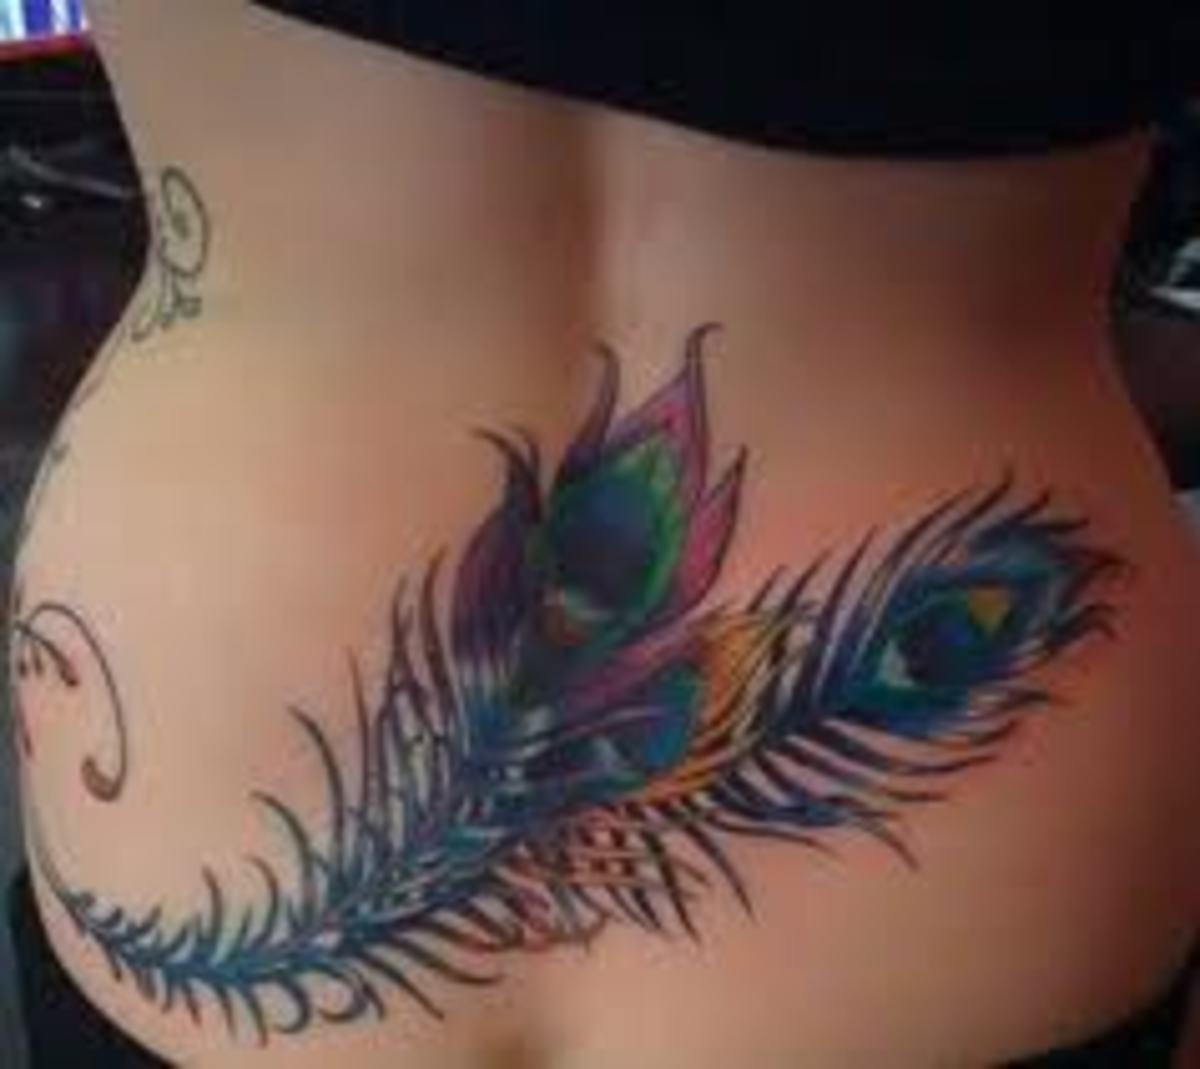 lower-back-tattoo-designs-popular-lower-back-tattoos